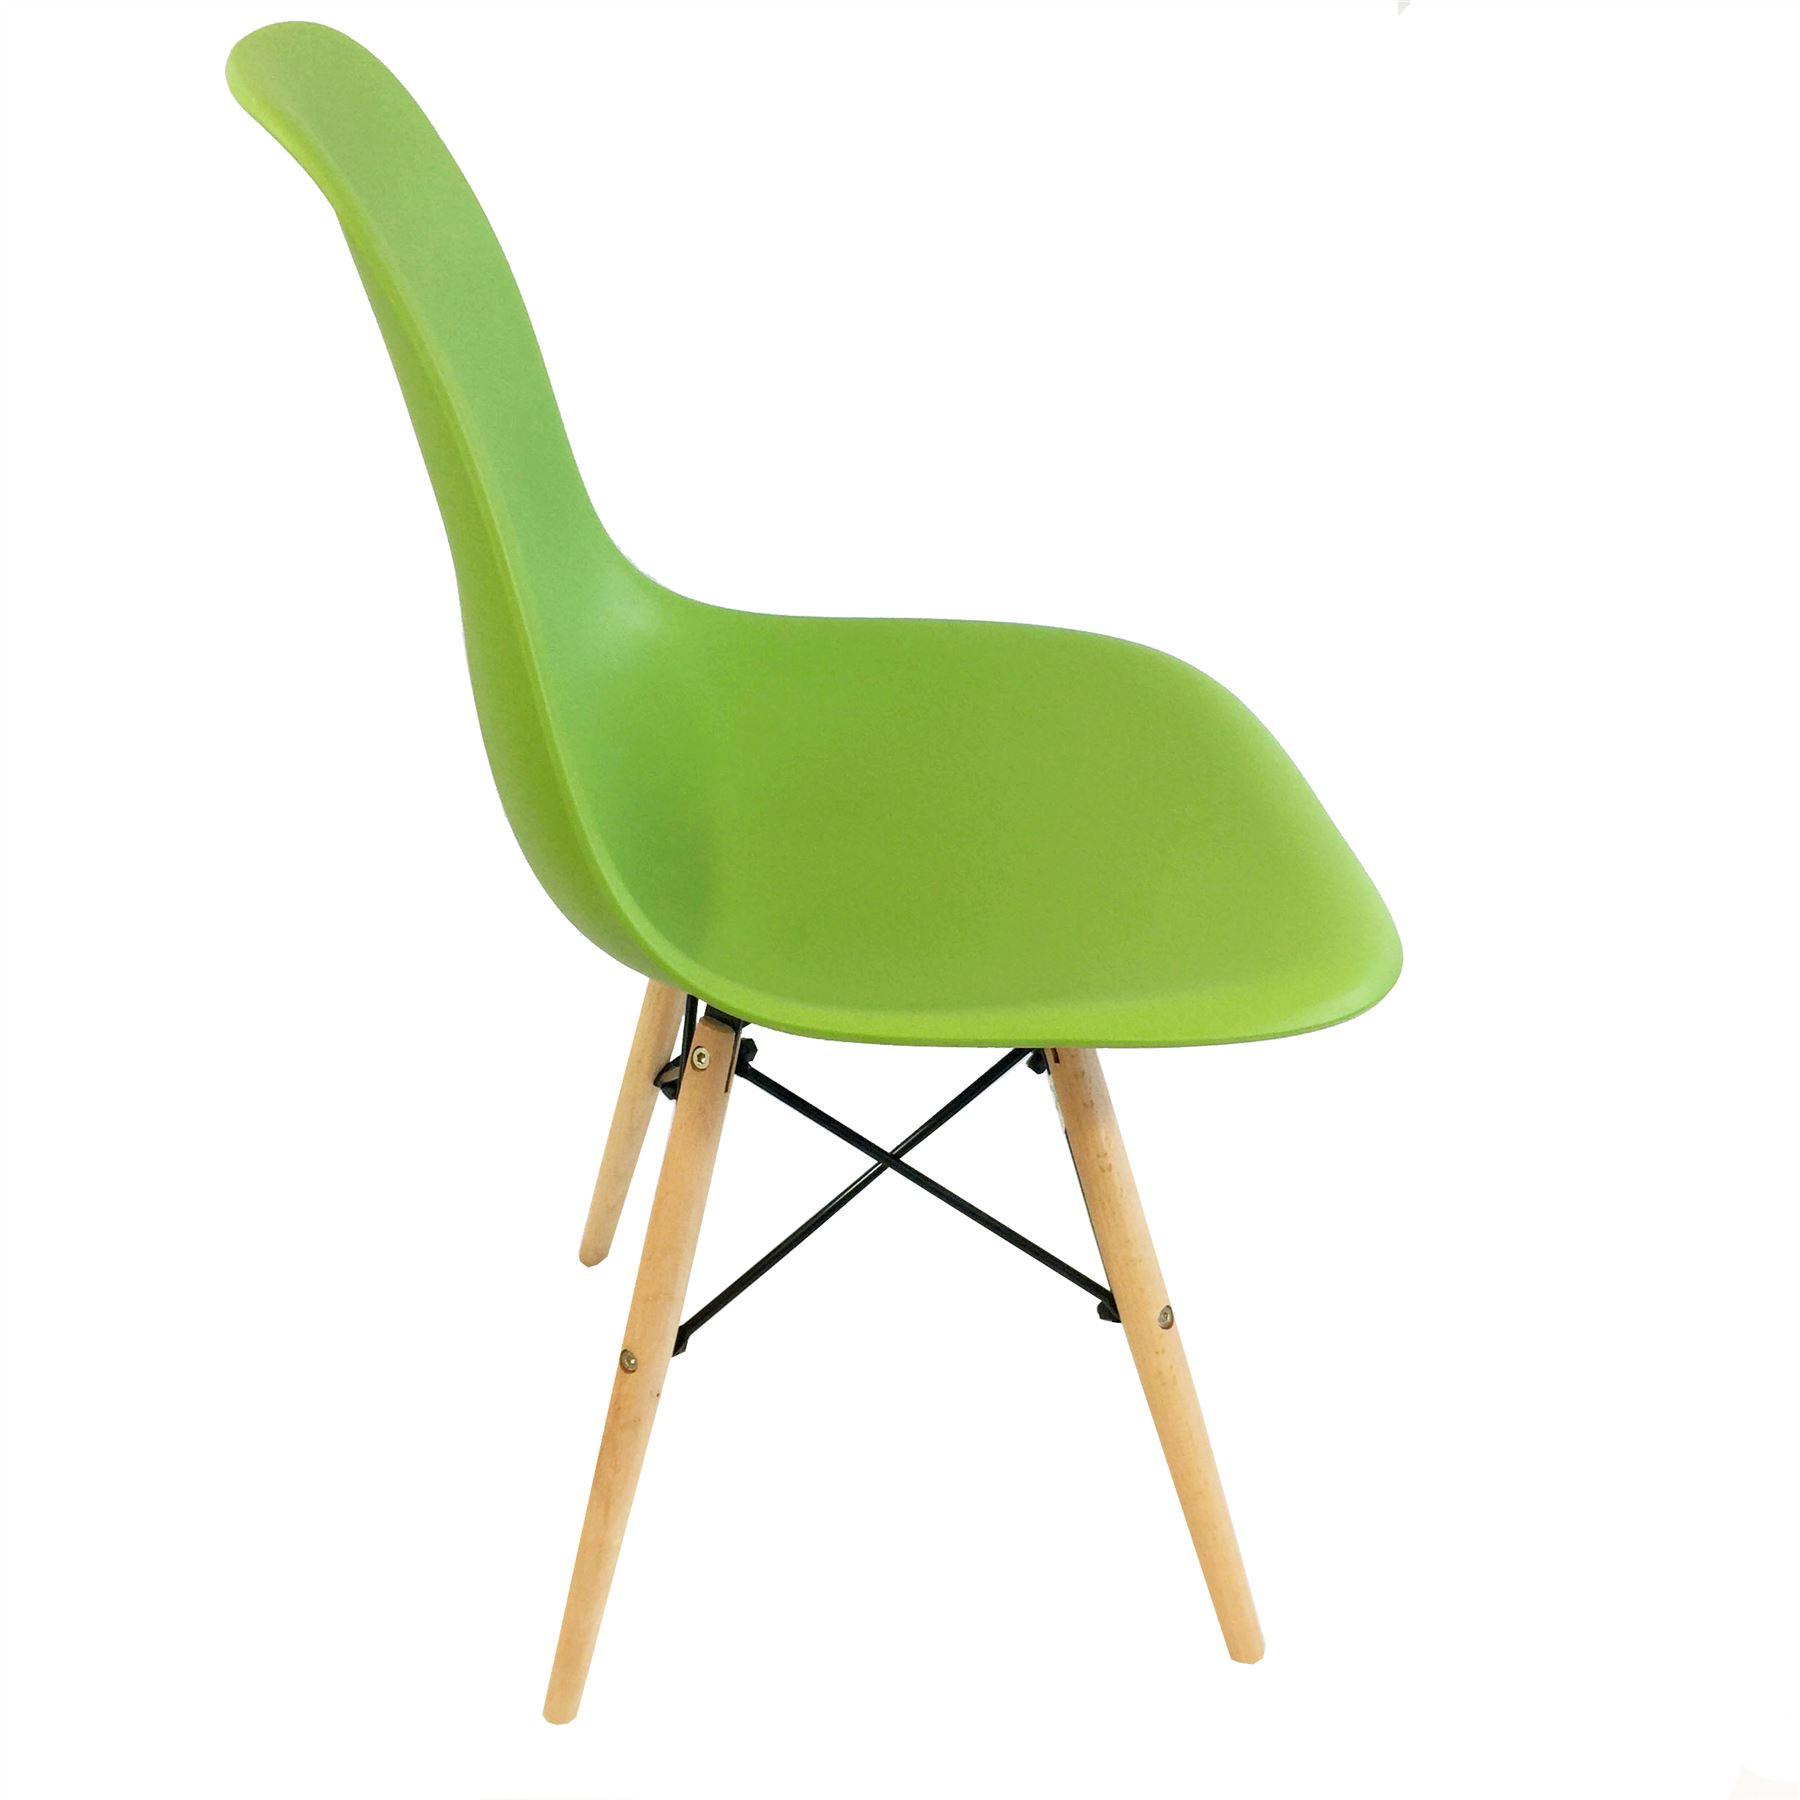 Wonderful Retro Dining Chairs DSW Eiffel Inspired Wooden Legs